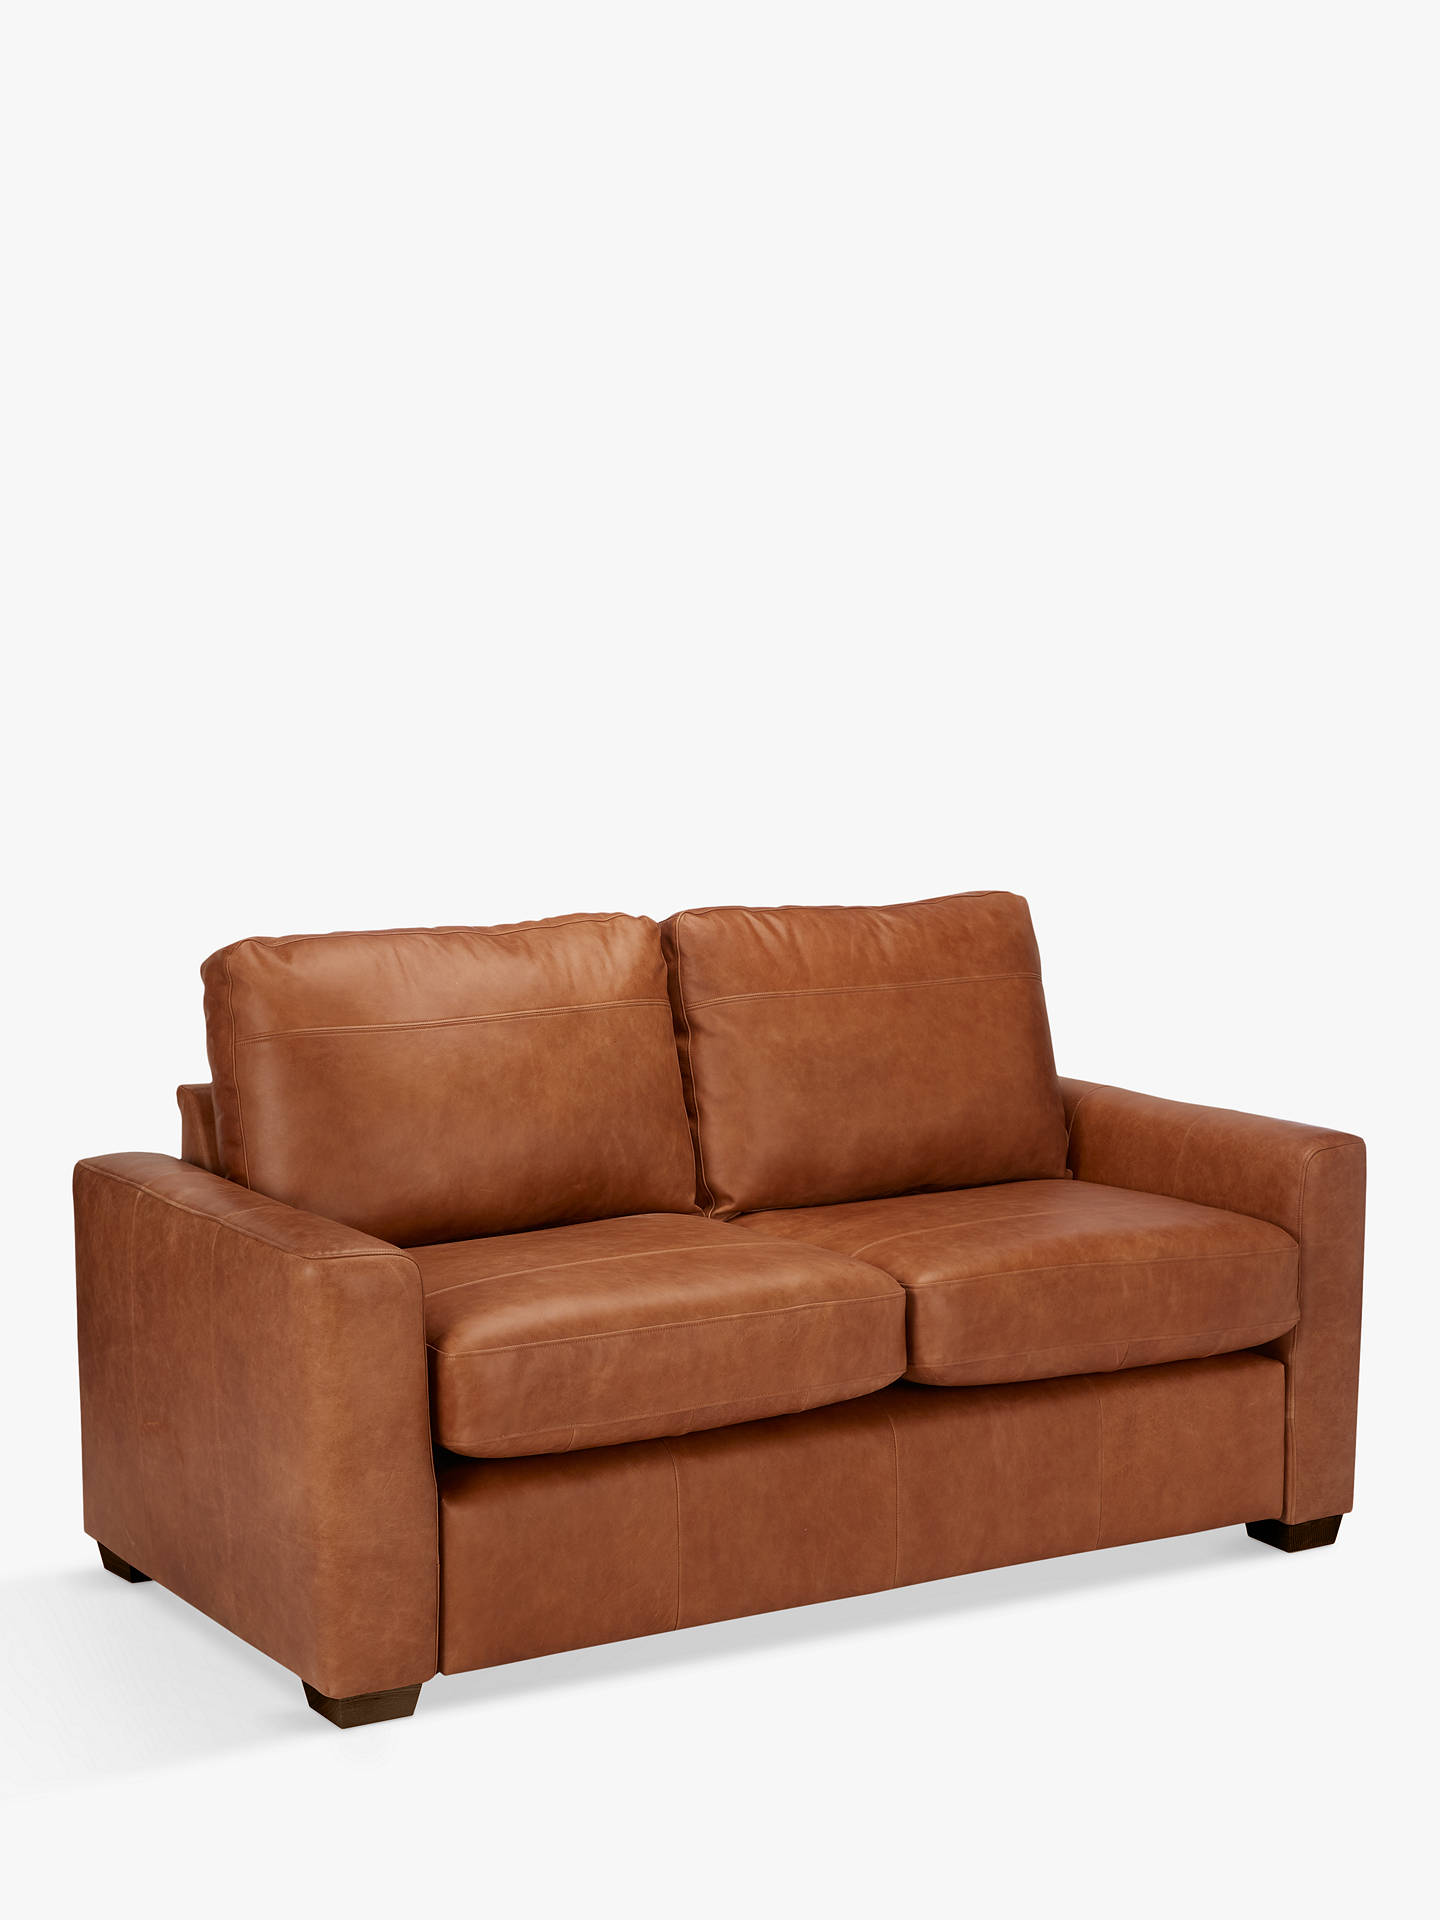 house by john lewis oliver medium 2 seater sofa light leg. Black Bedroom Furniture Sets. Home Design Ideas